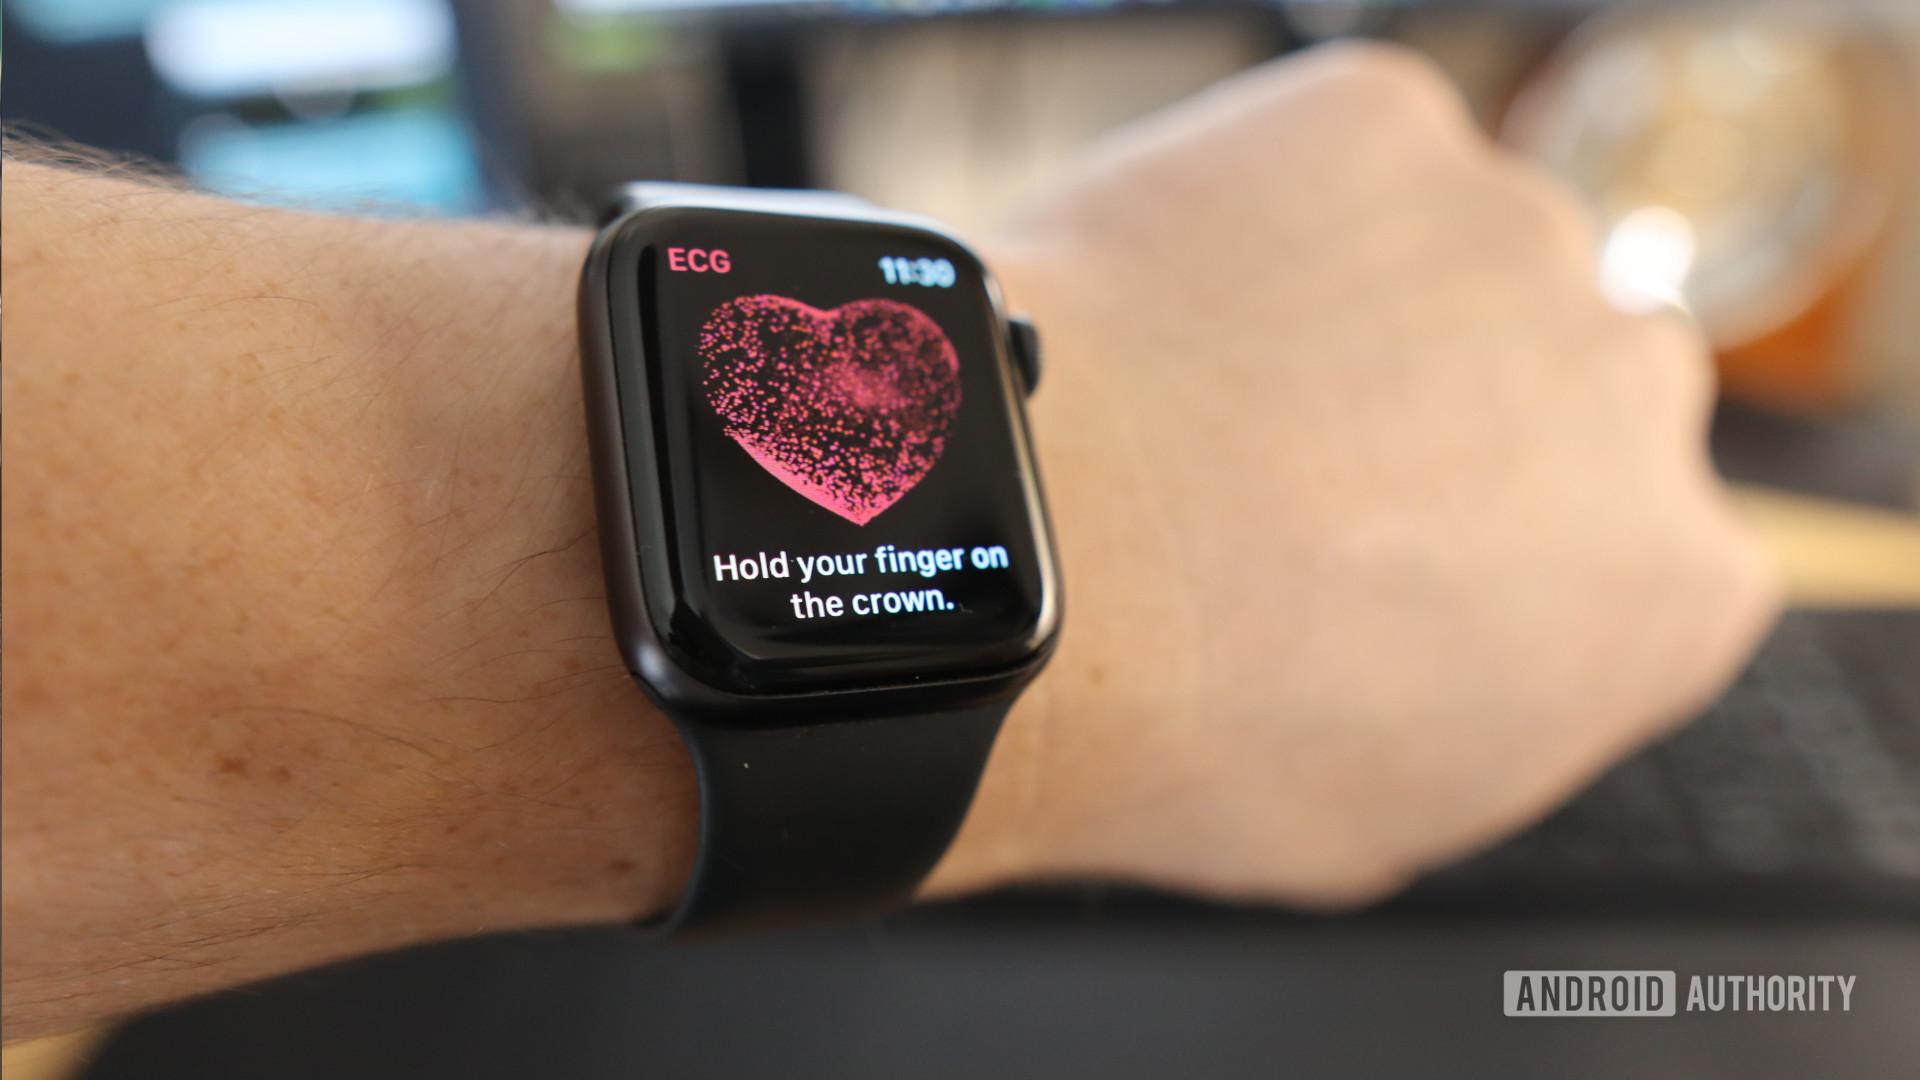 ECG Apple Watch App 2